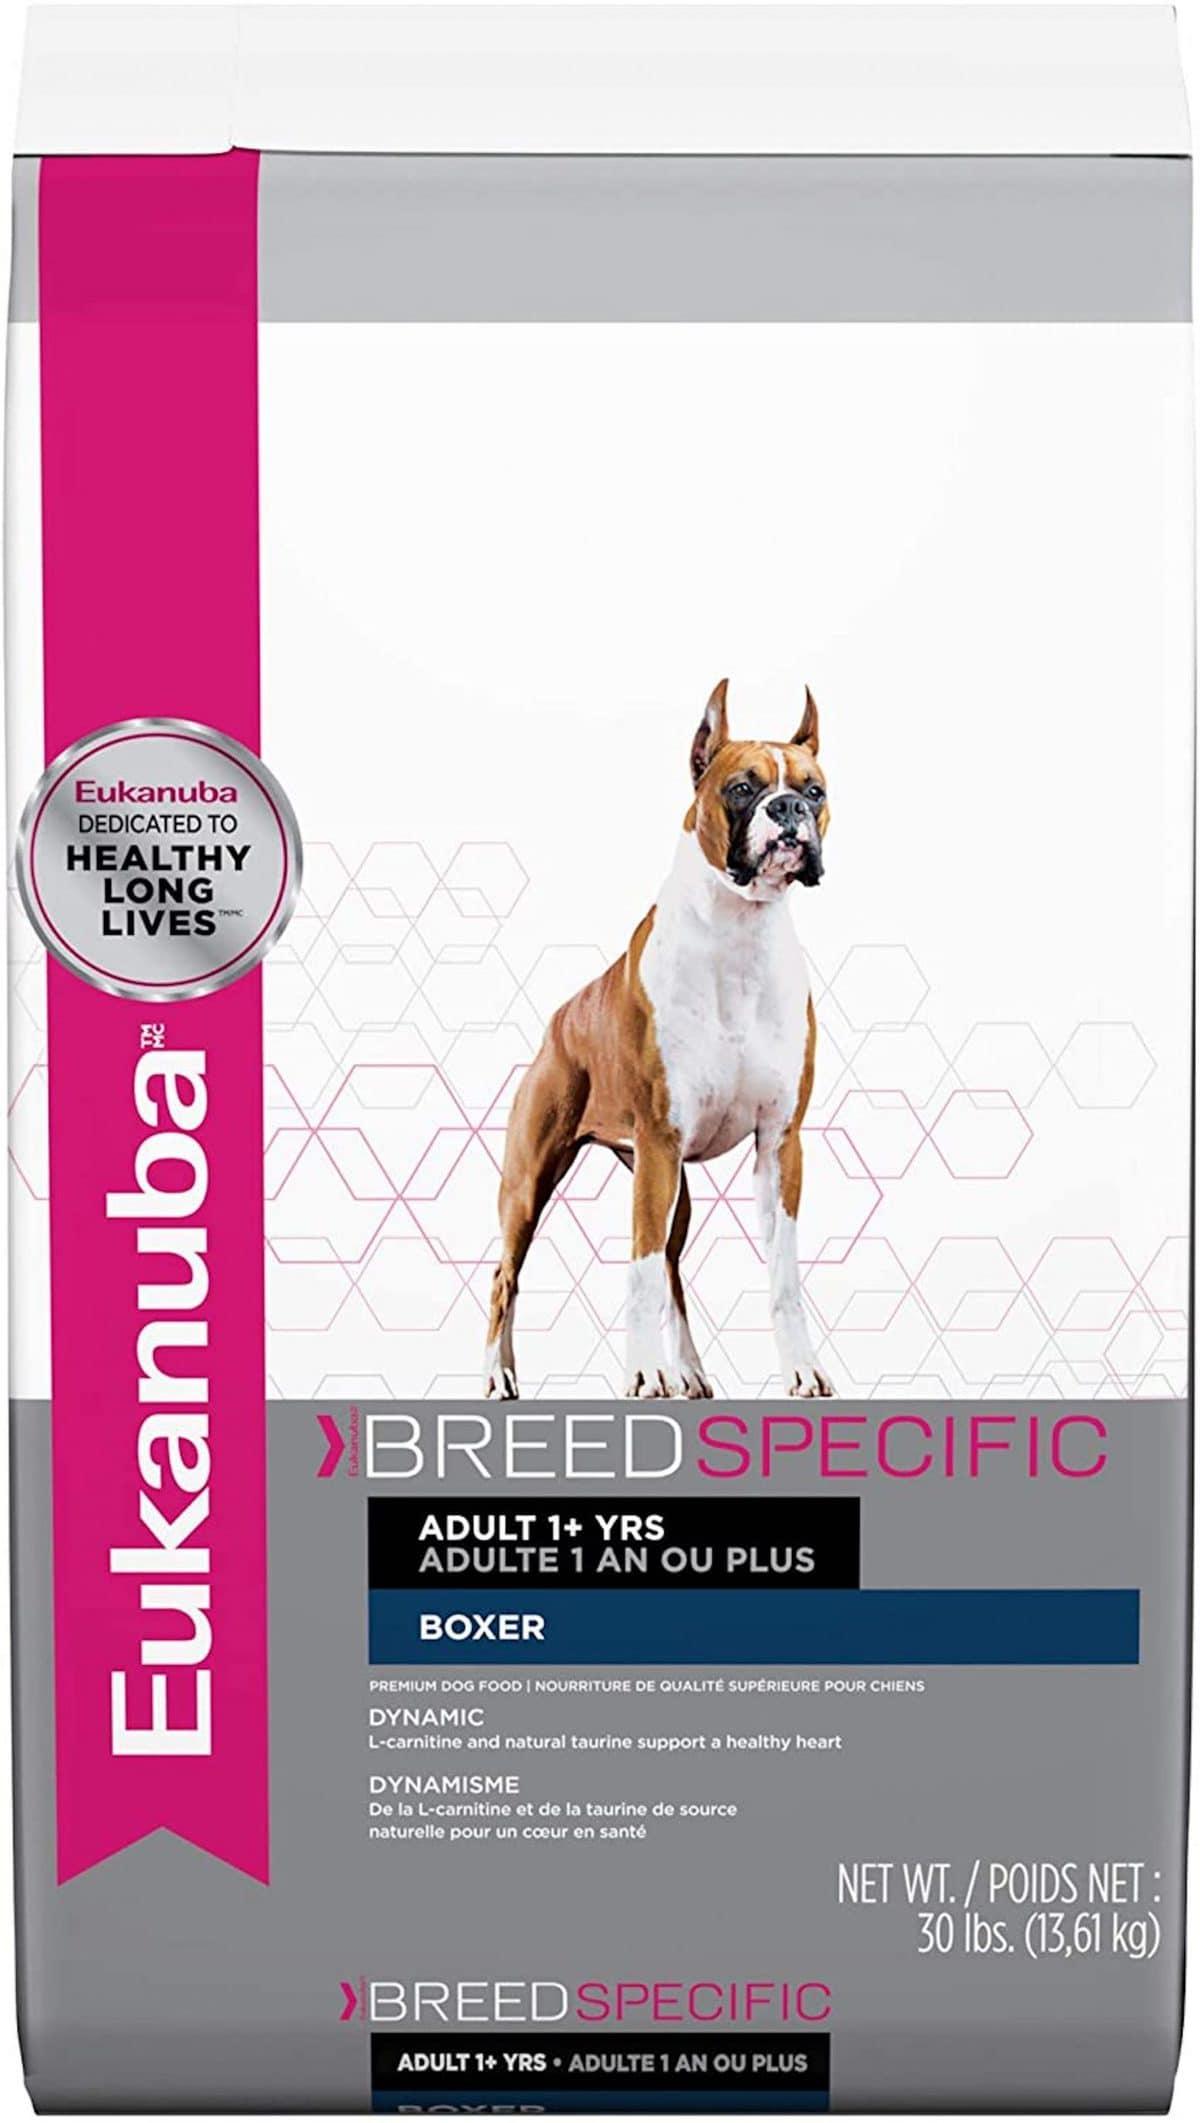 Eukanuba Breed Specific Boxer Dog Food